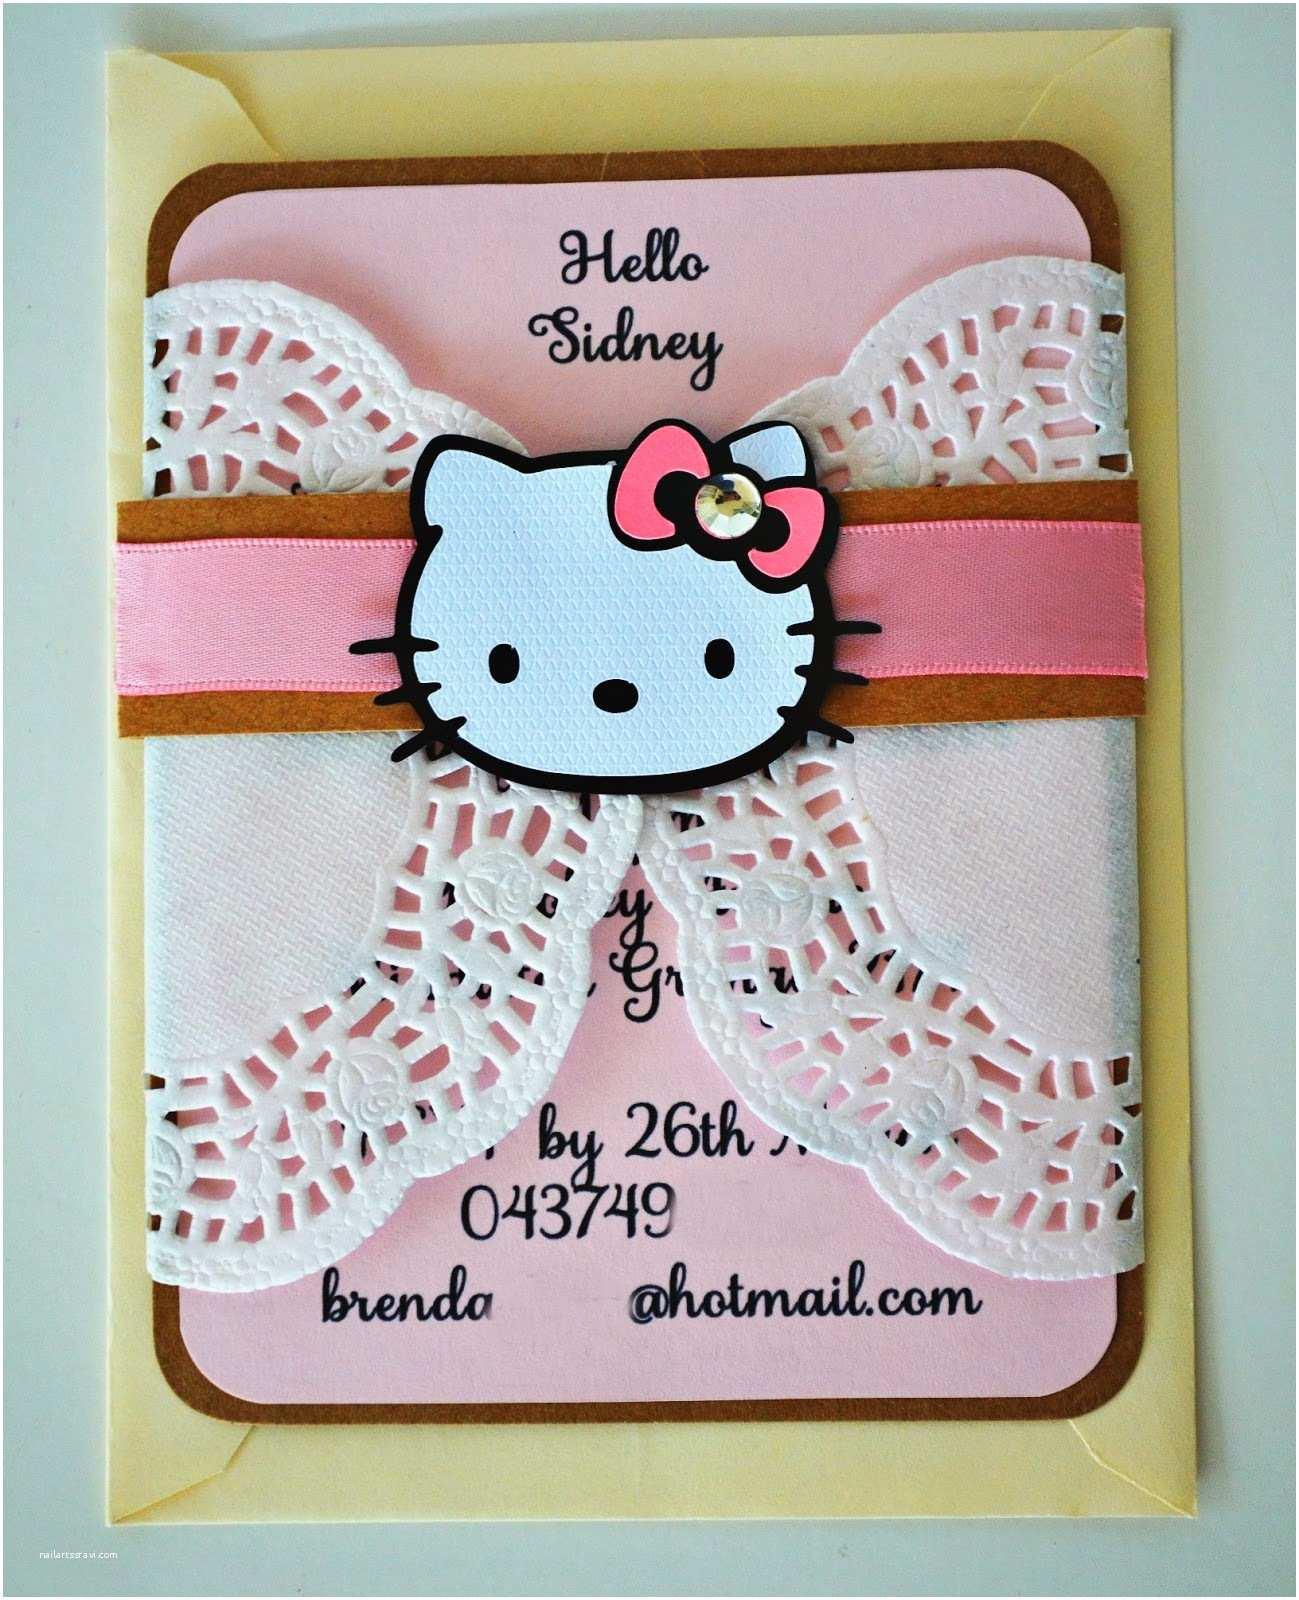 Hello Kitty Baby Shower Invitations Birthday and Baby Shower Invitations Hello Kitty Doily